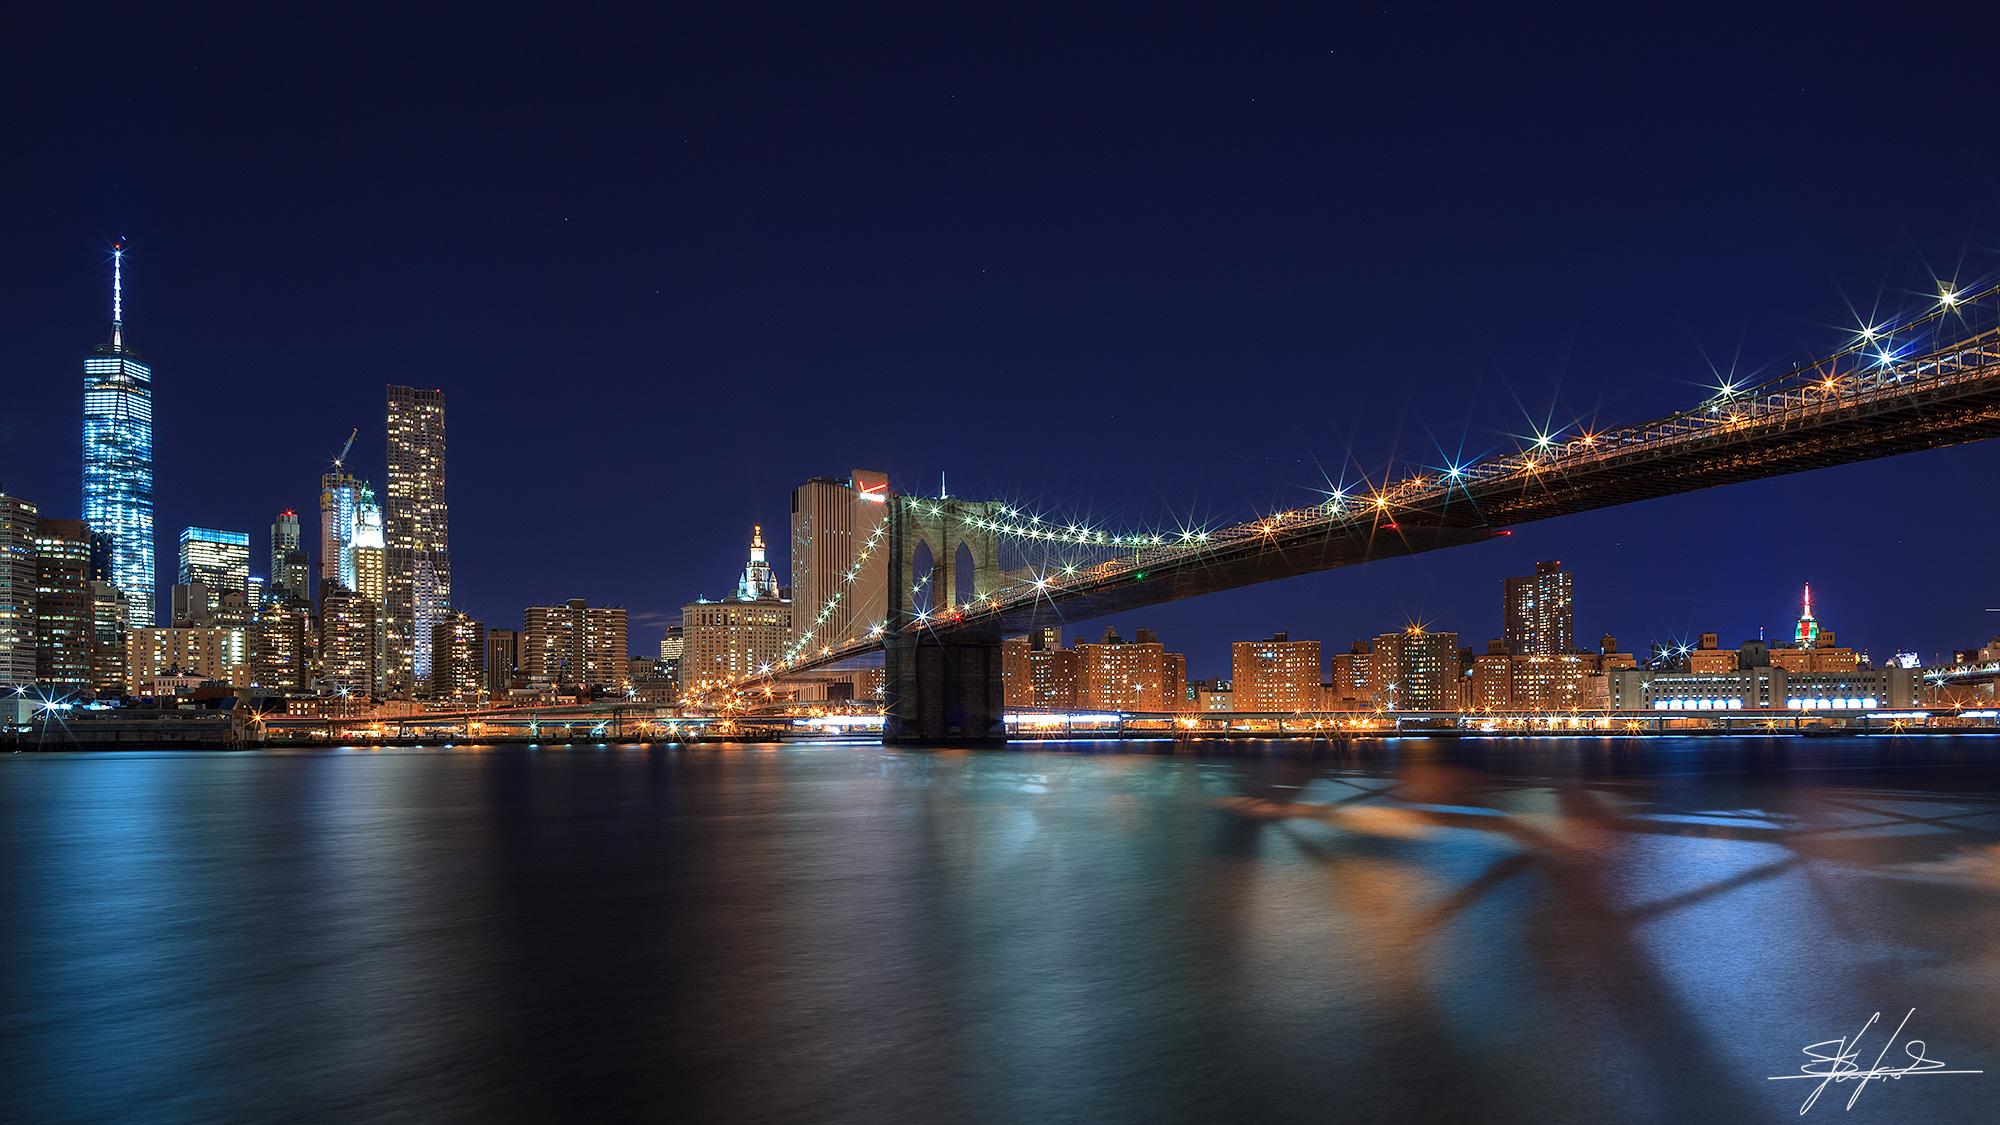 The Brooklyn Bridge (2014)